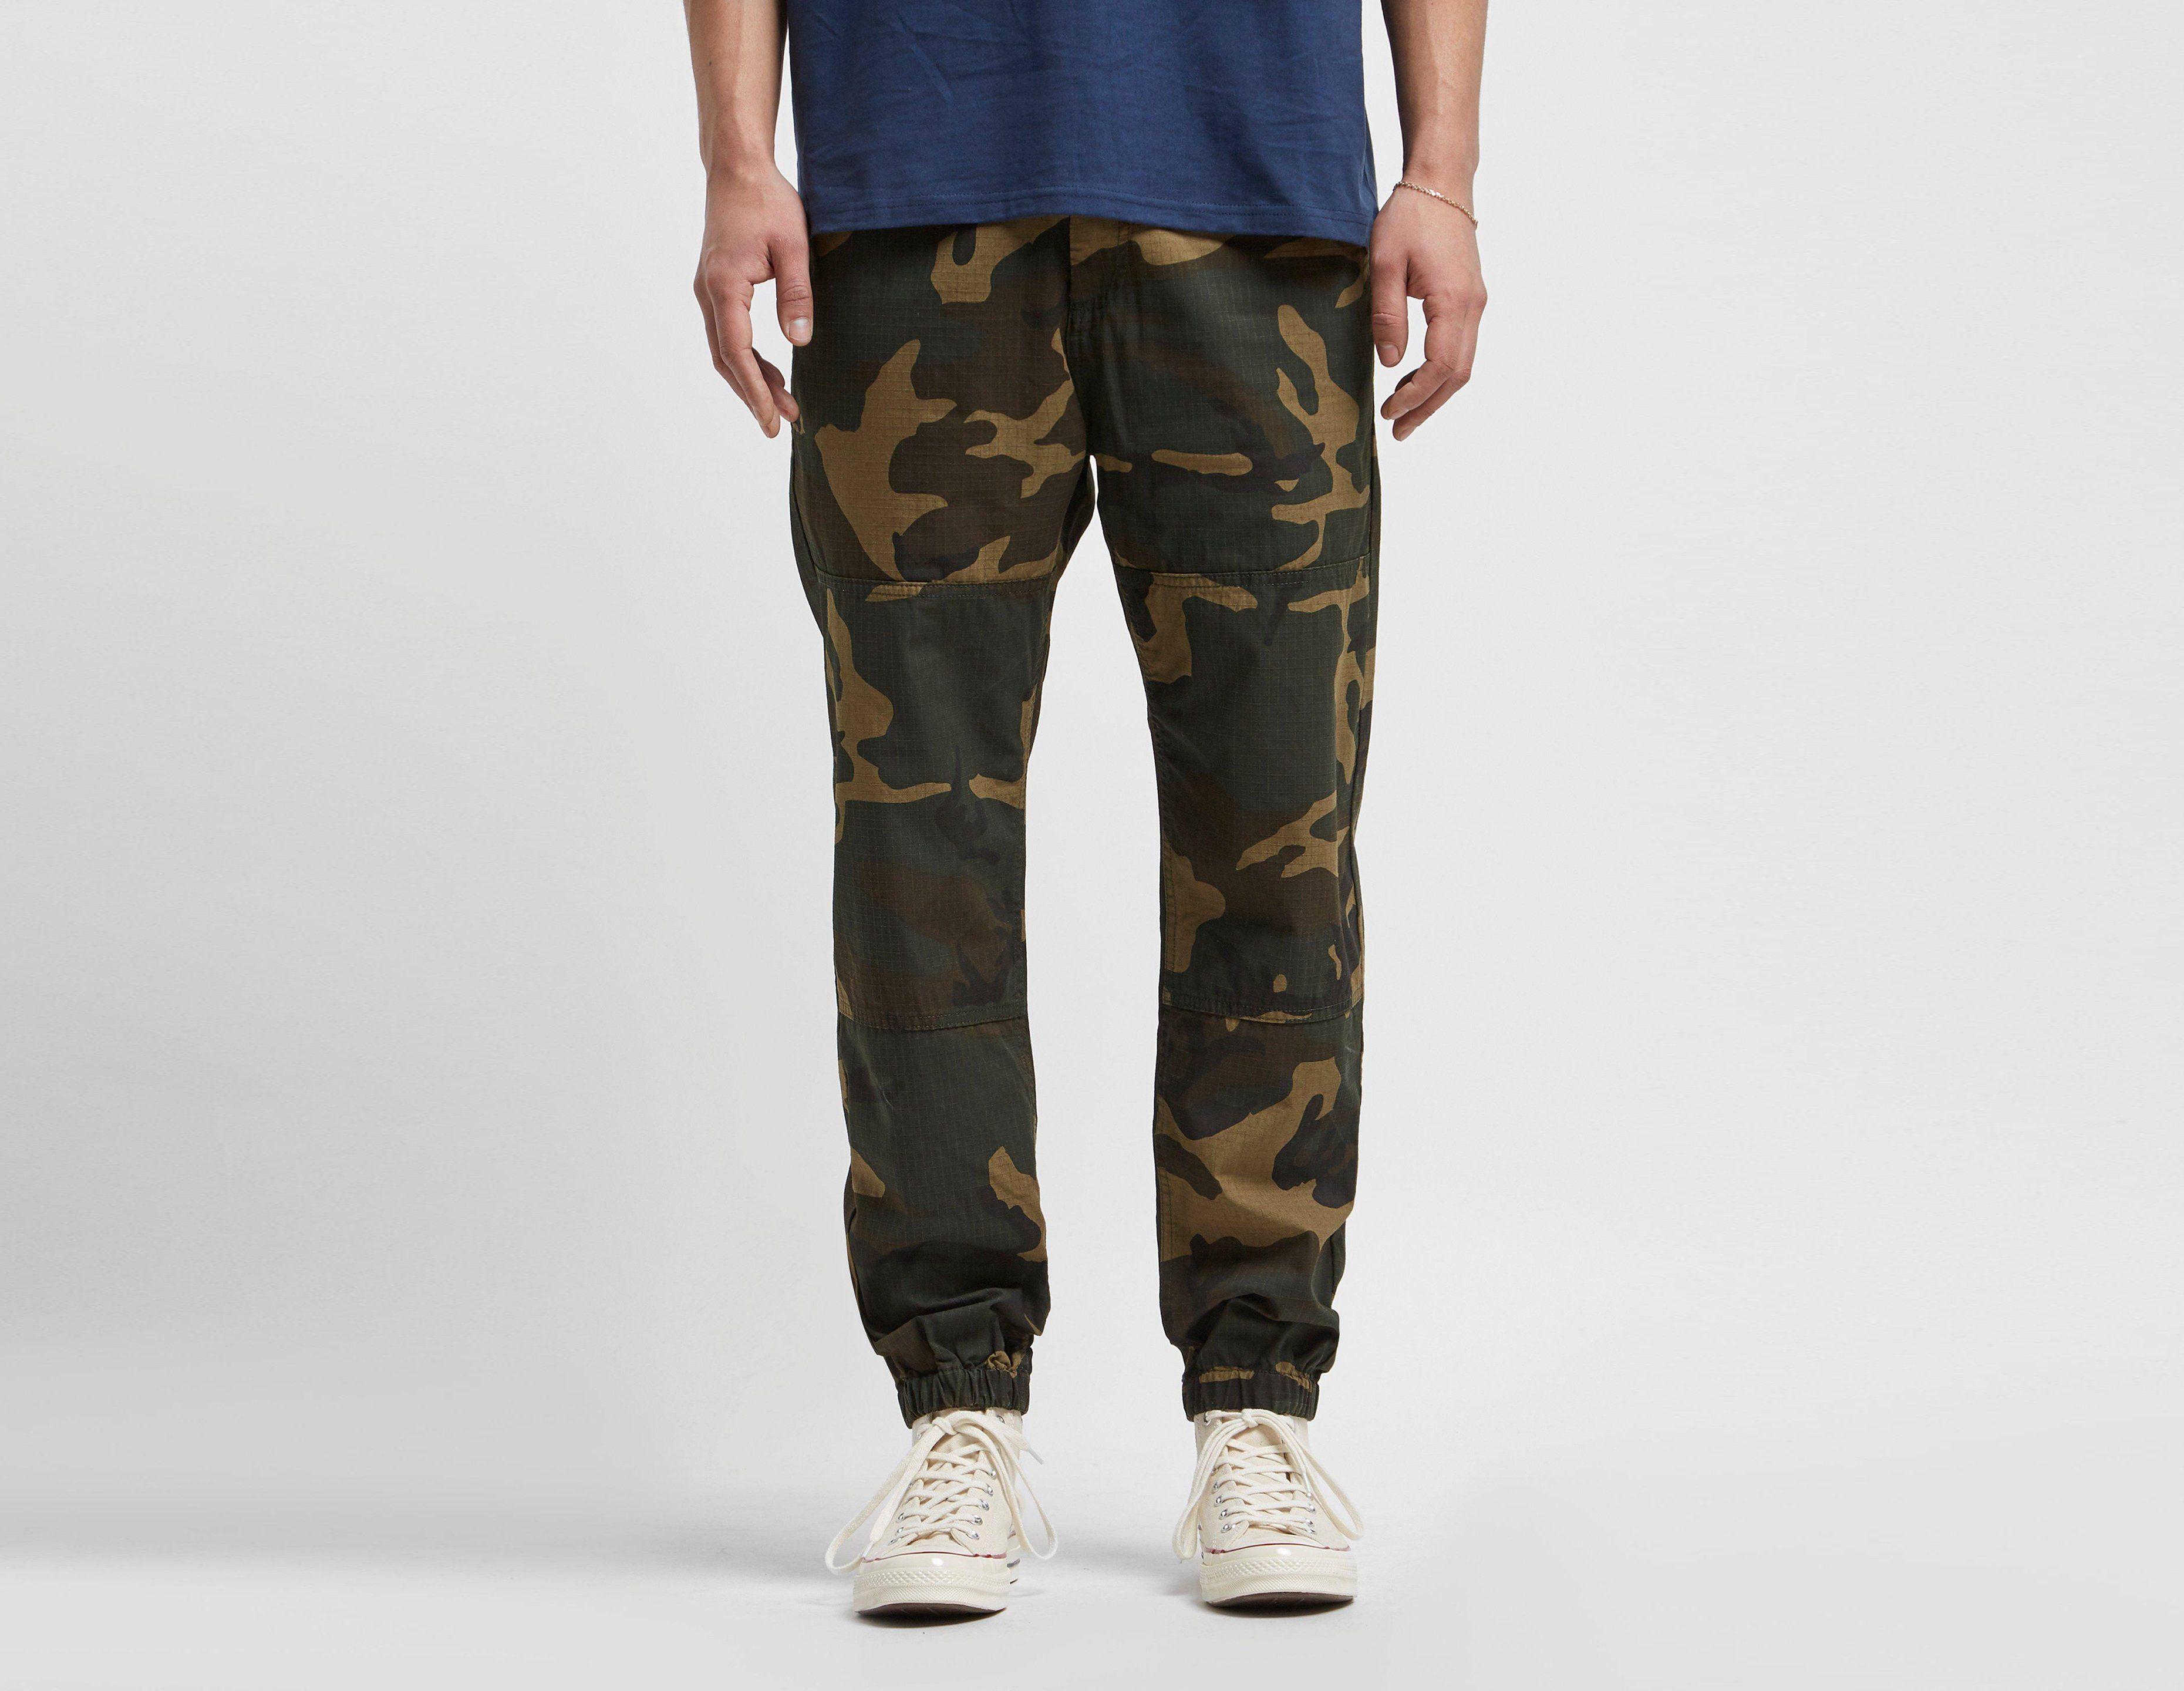 Carhartt WIP Marshall Jogger Trousers